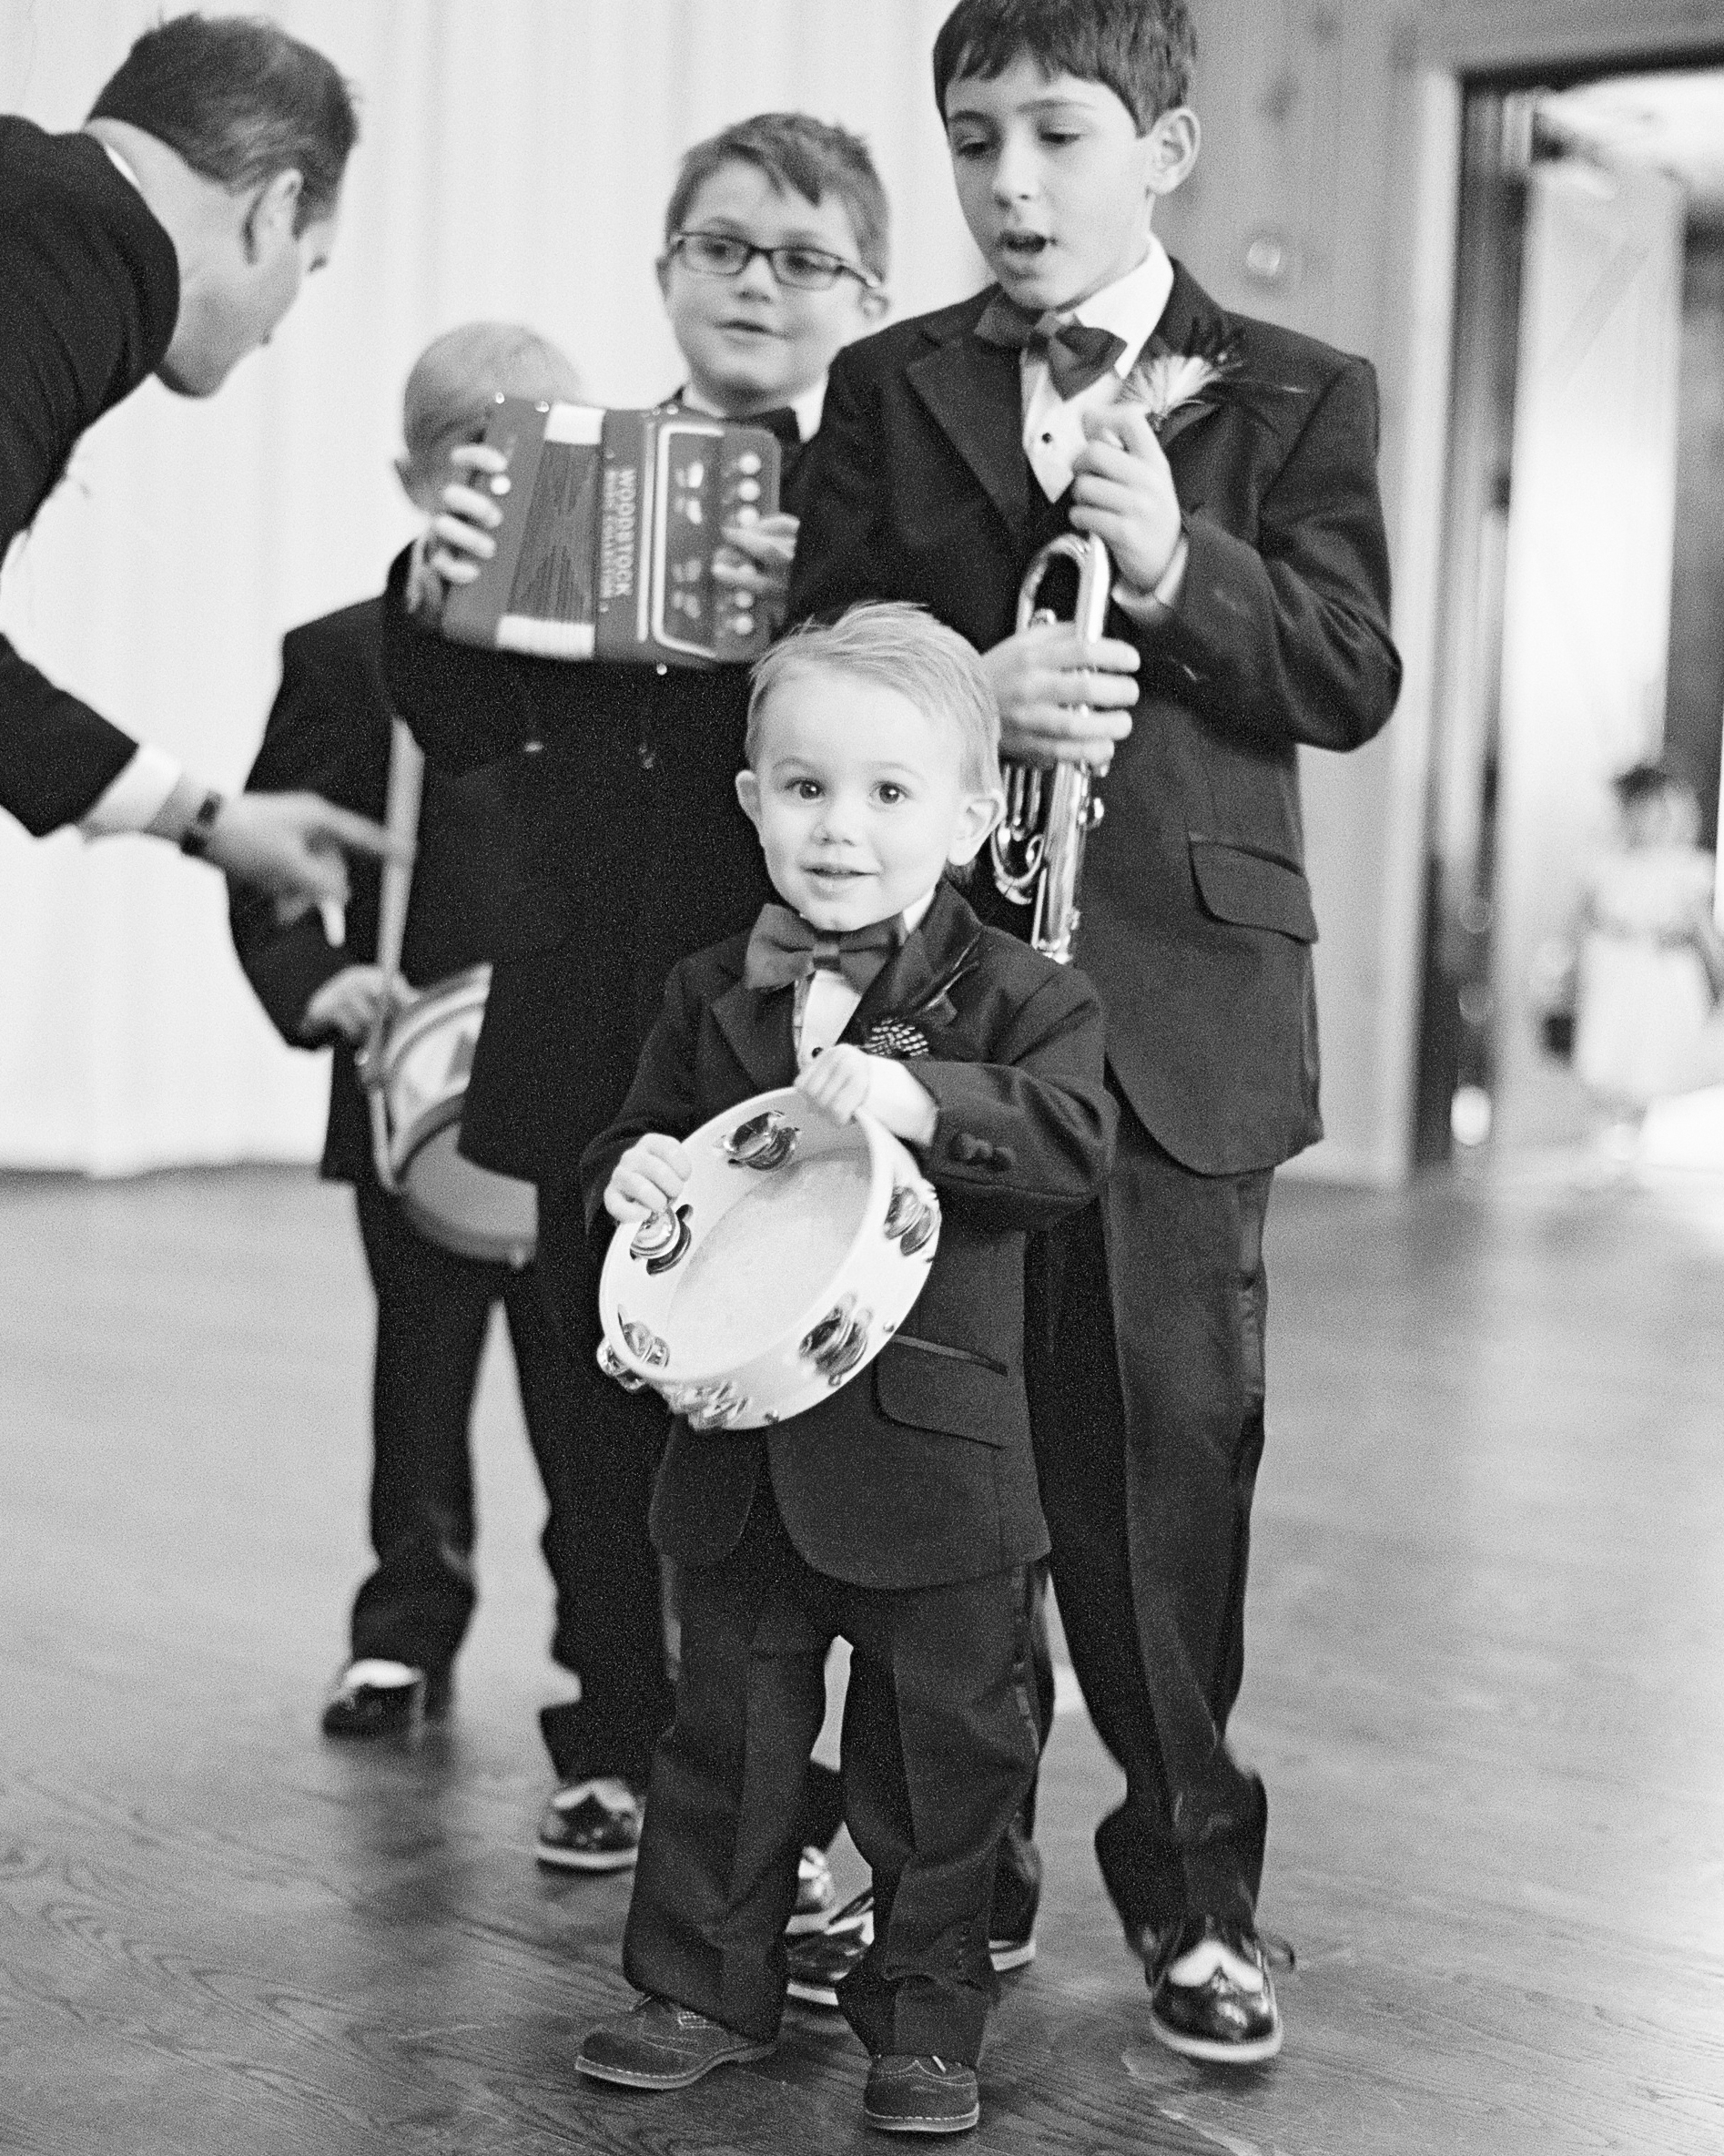 tiffany-nicholas-wedding-boys-103-s111339-0714.jpg